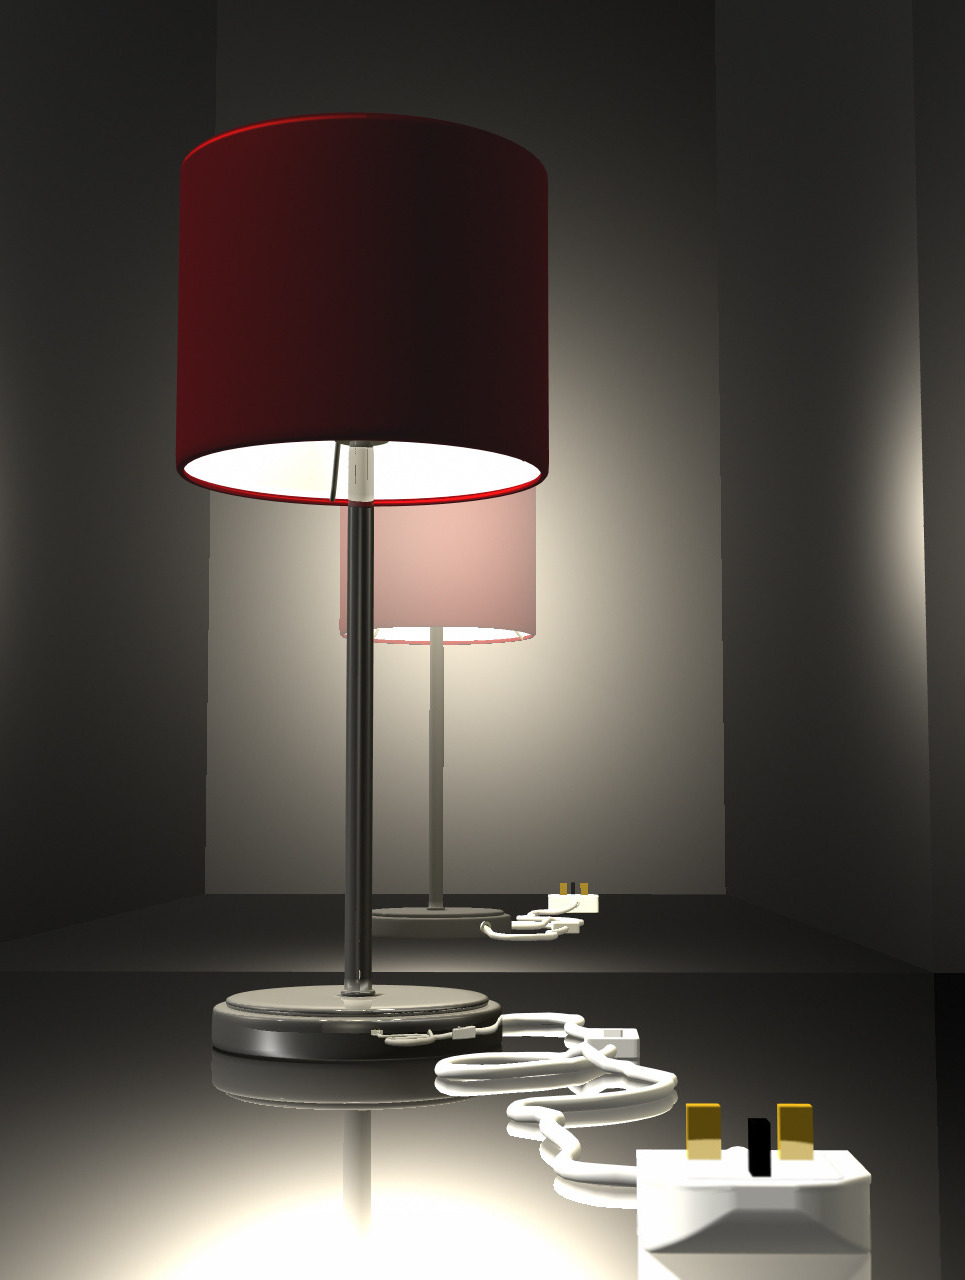 Tablelamp1 show